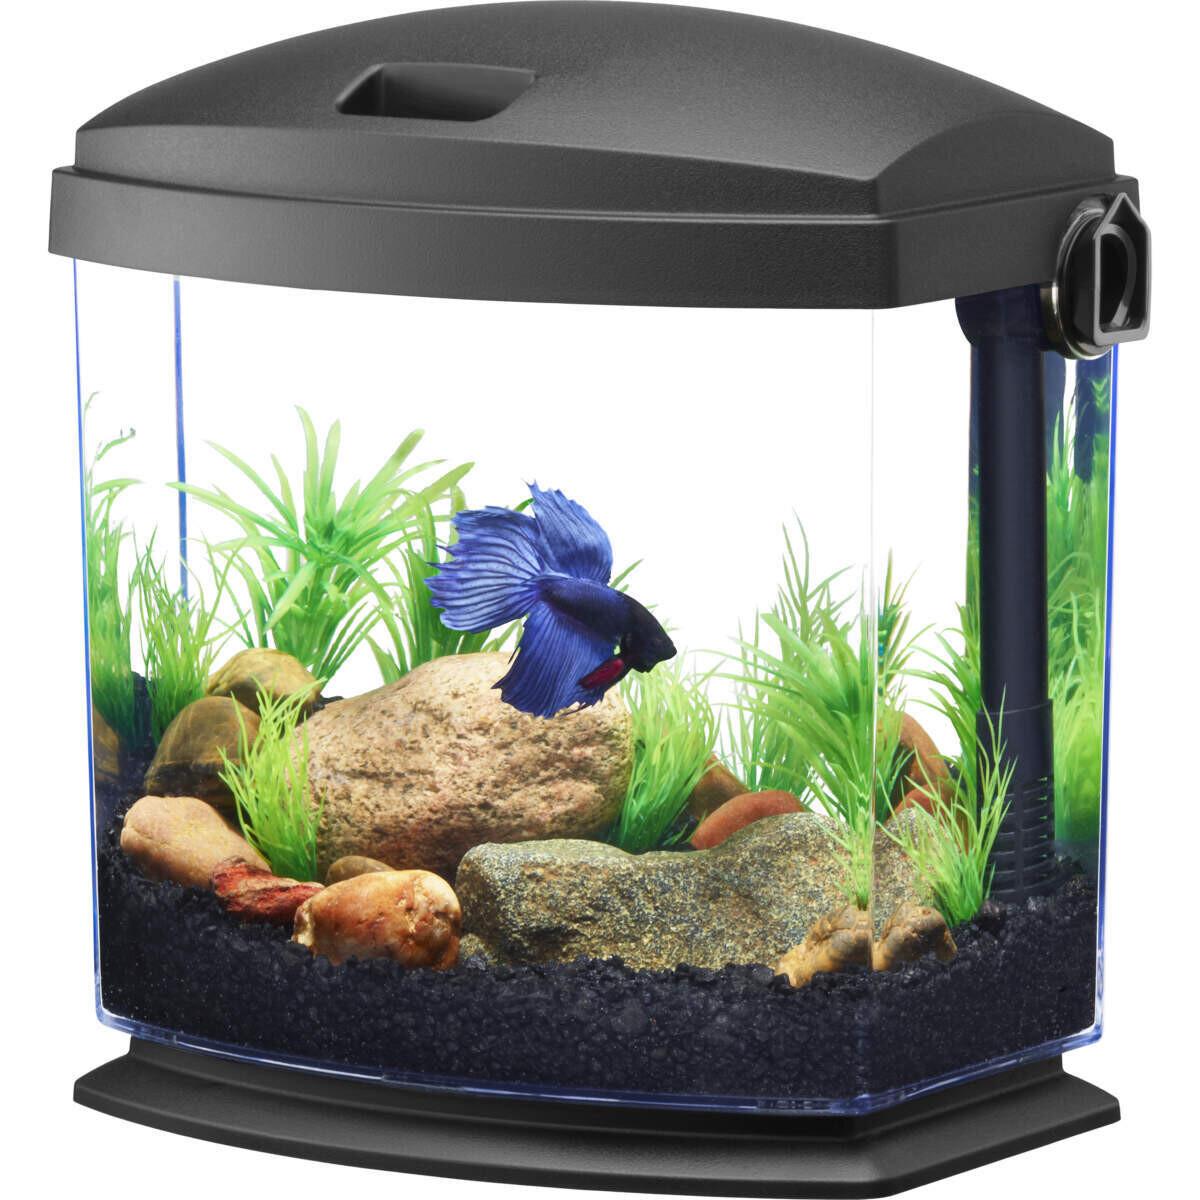 Aqueon LED BettaBow 1 Gal  Aquarium Kit